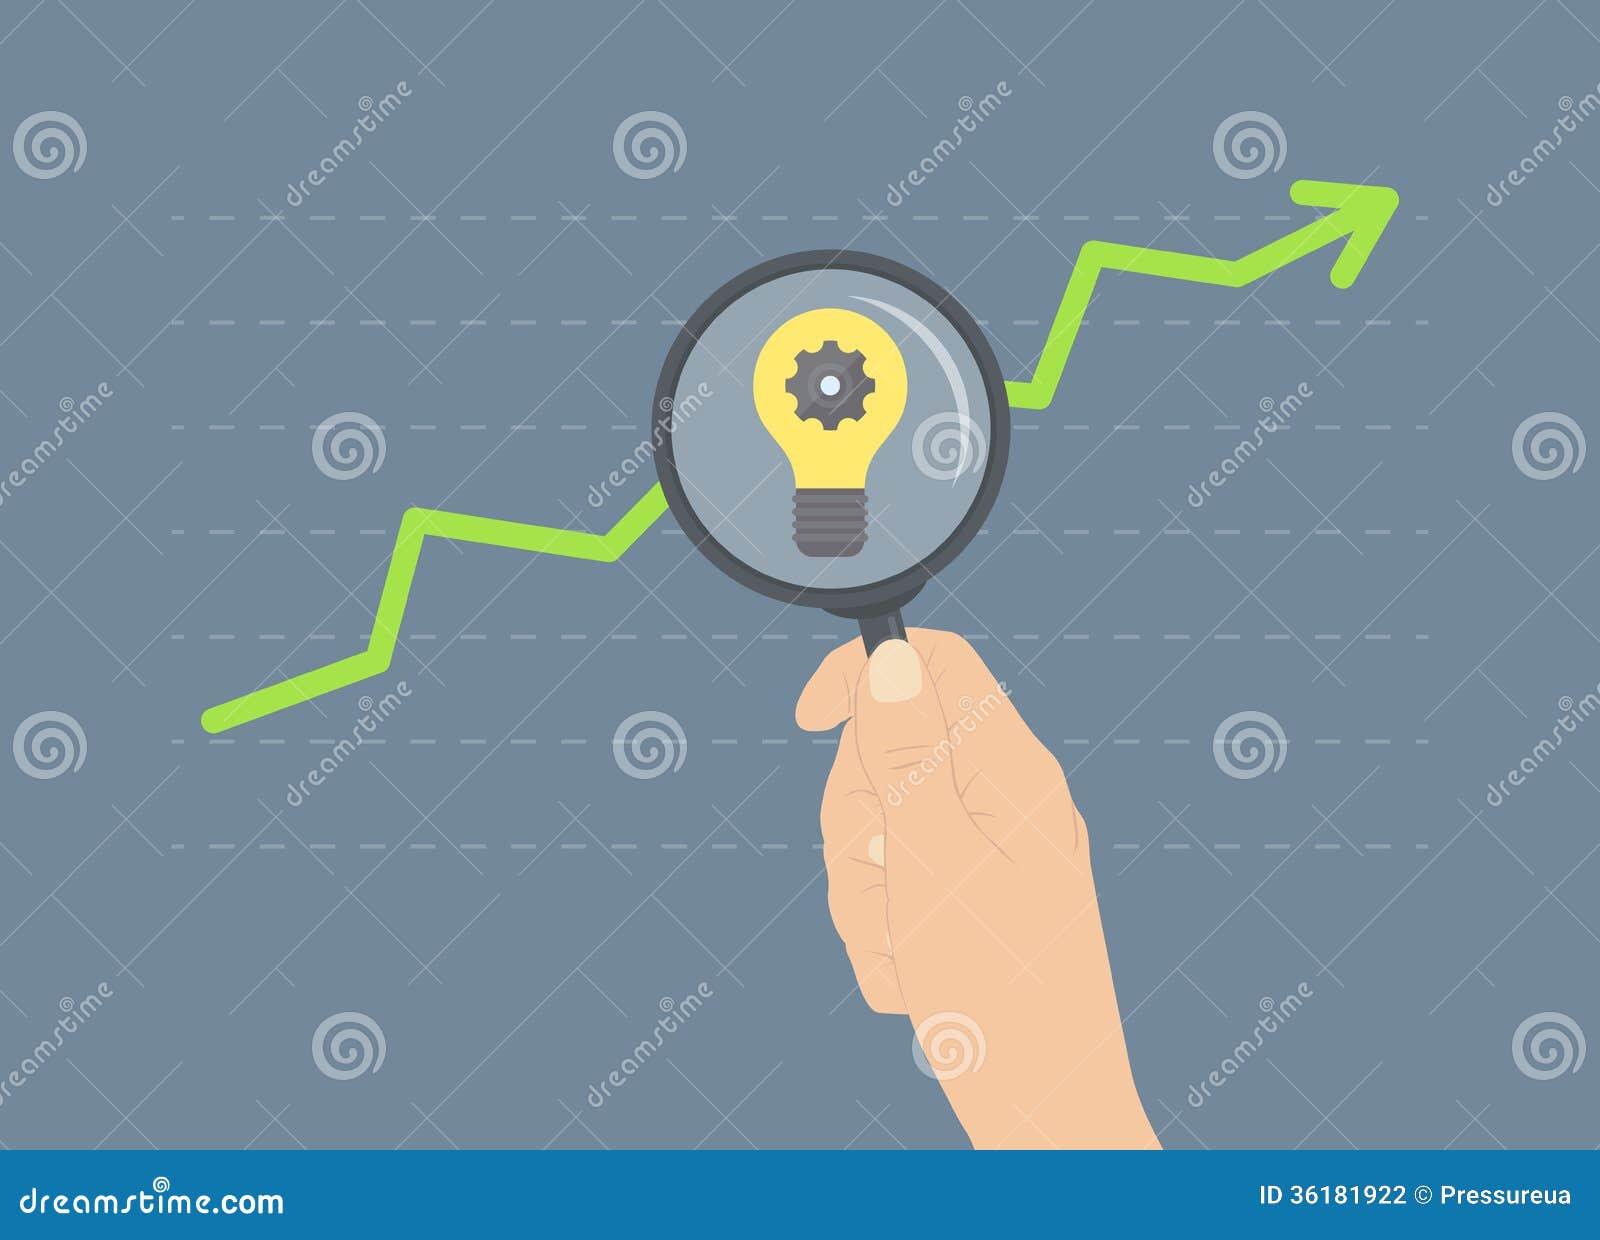 Analyzing Growth Flat Illustration Concept Stock Photography - Image: 36181922